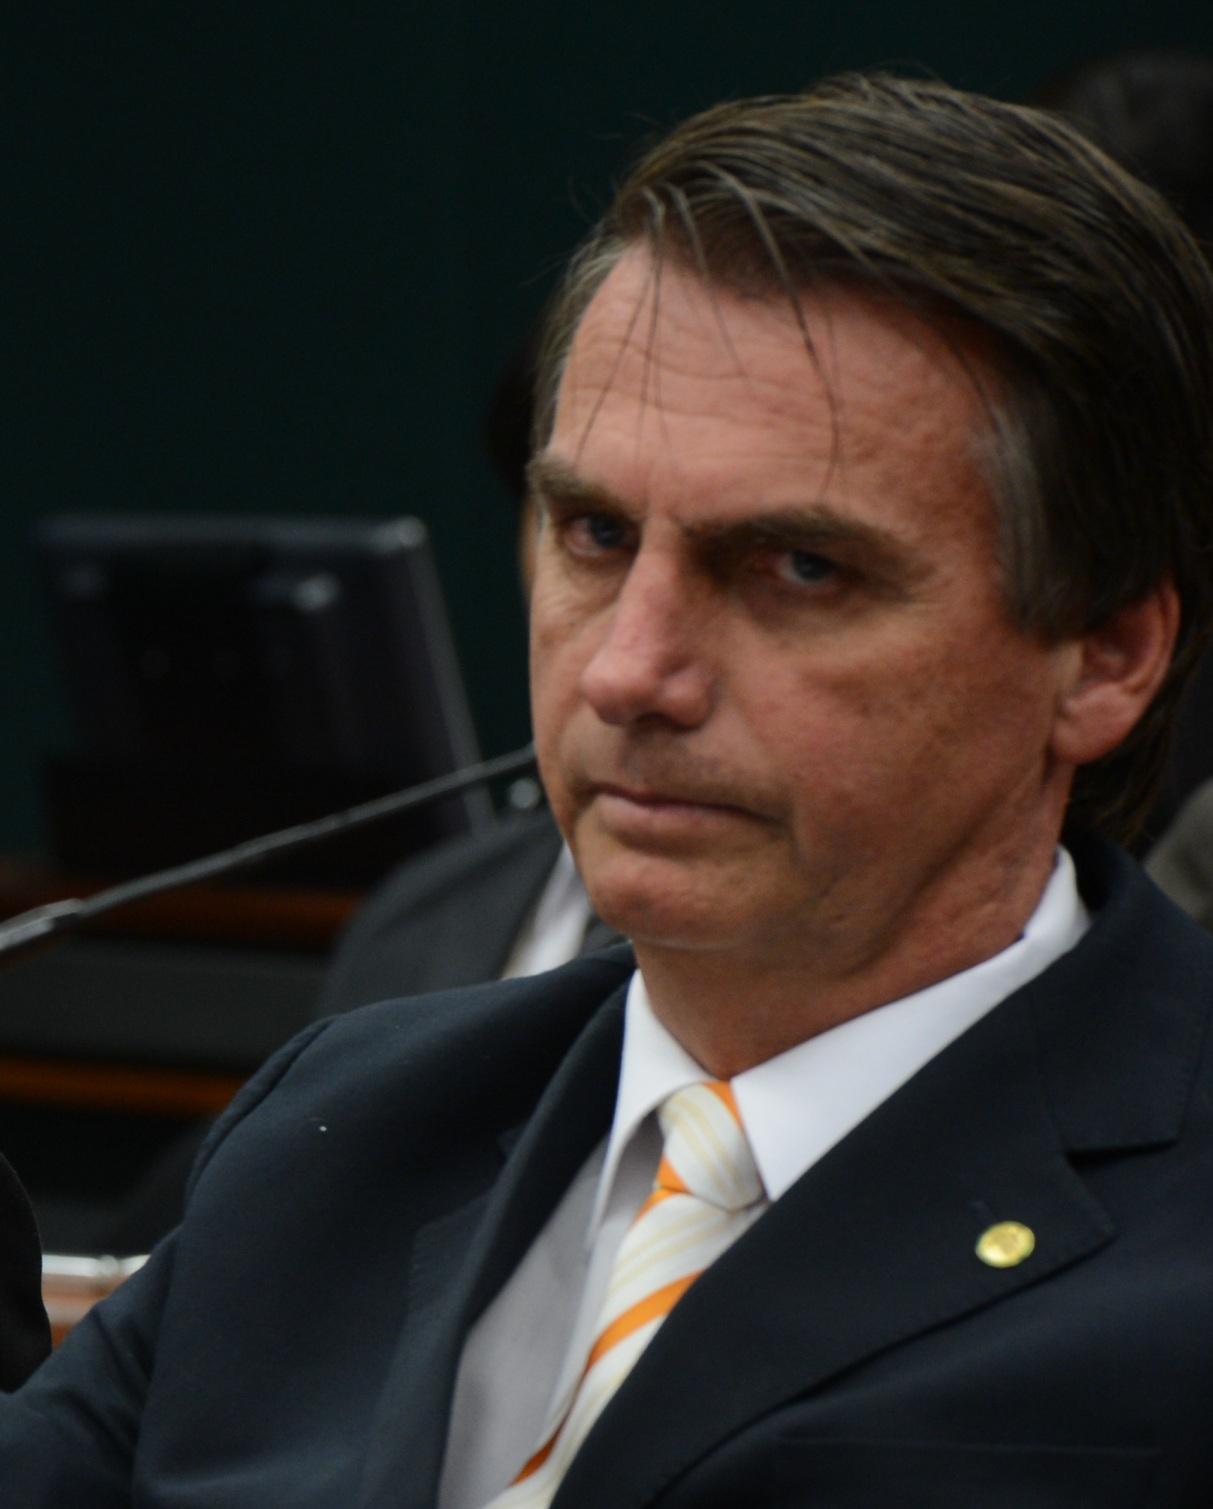 Bolsonaro [Wikipedia]